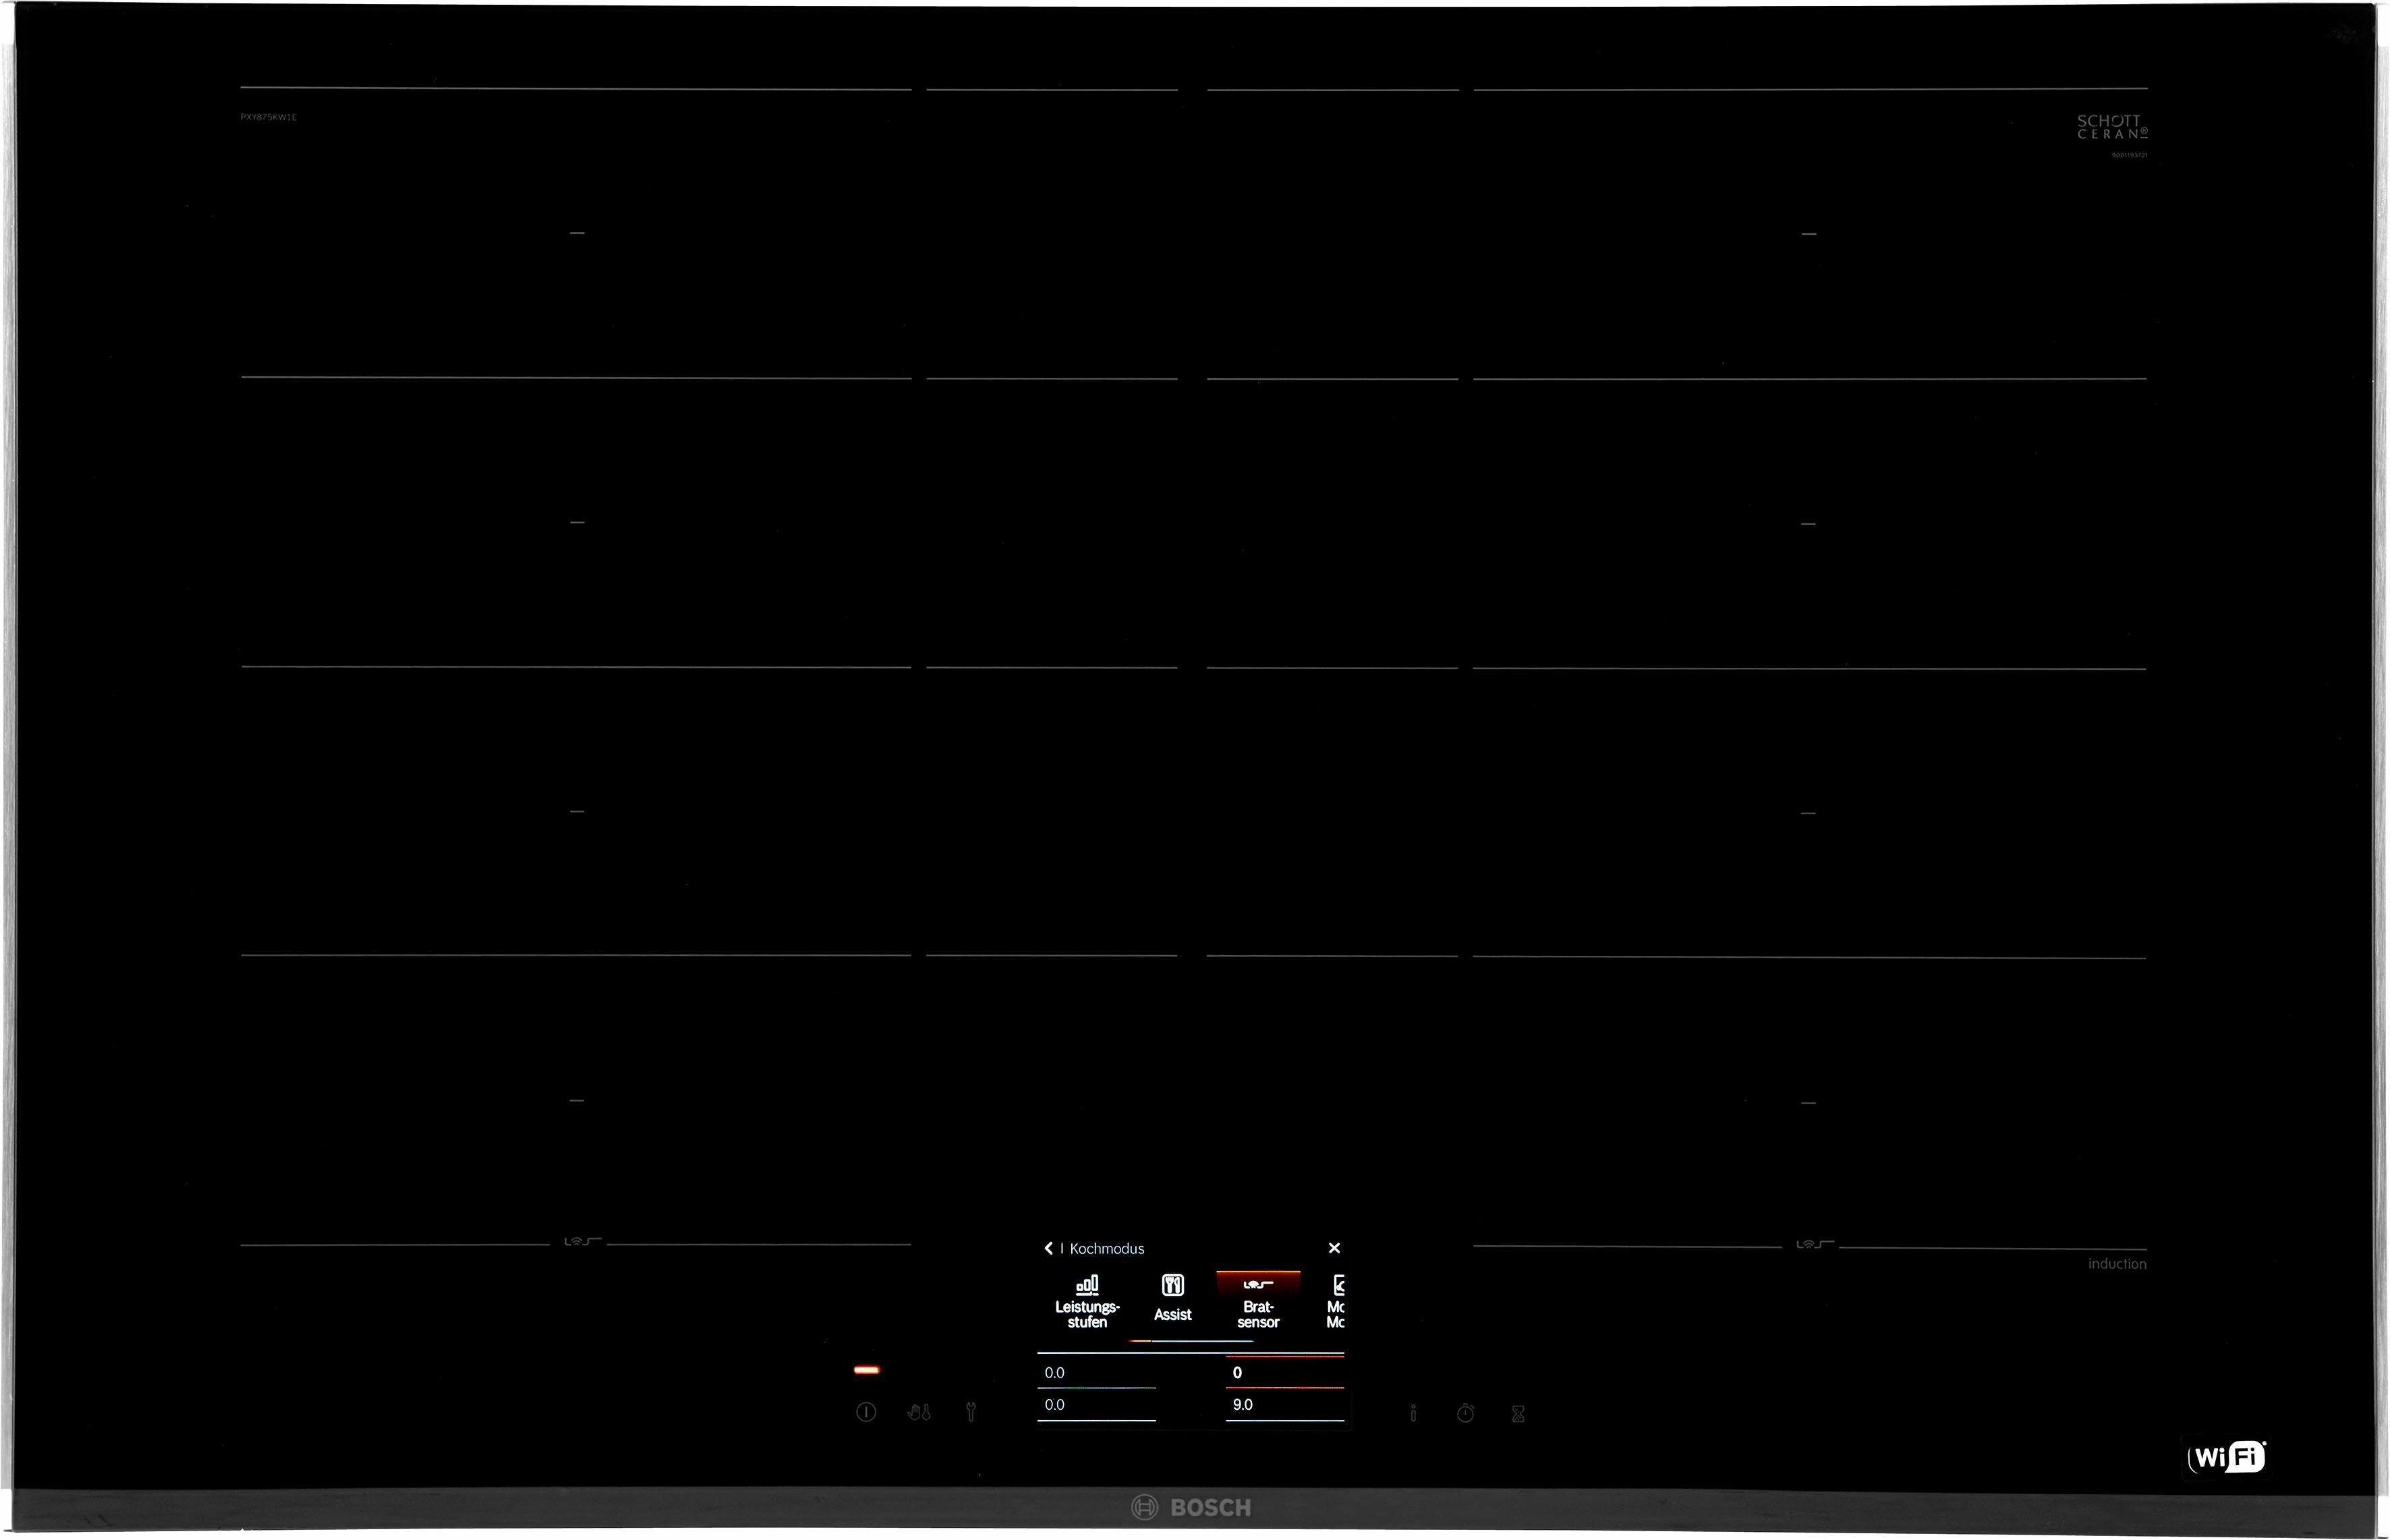 BOSCH Flex-Induktions-Kochfeld PXY875KW1E, mit PerfectFry-Bratsensor